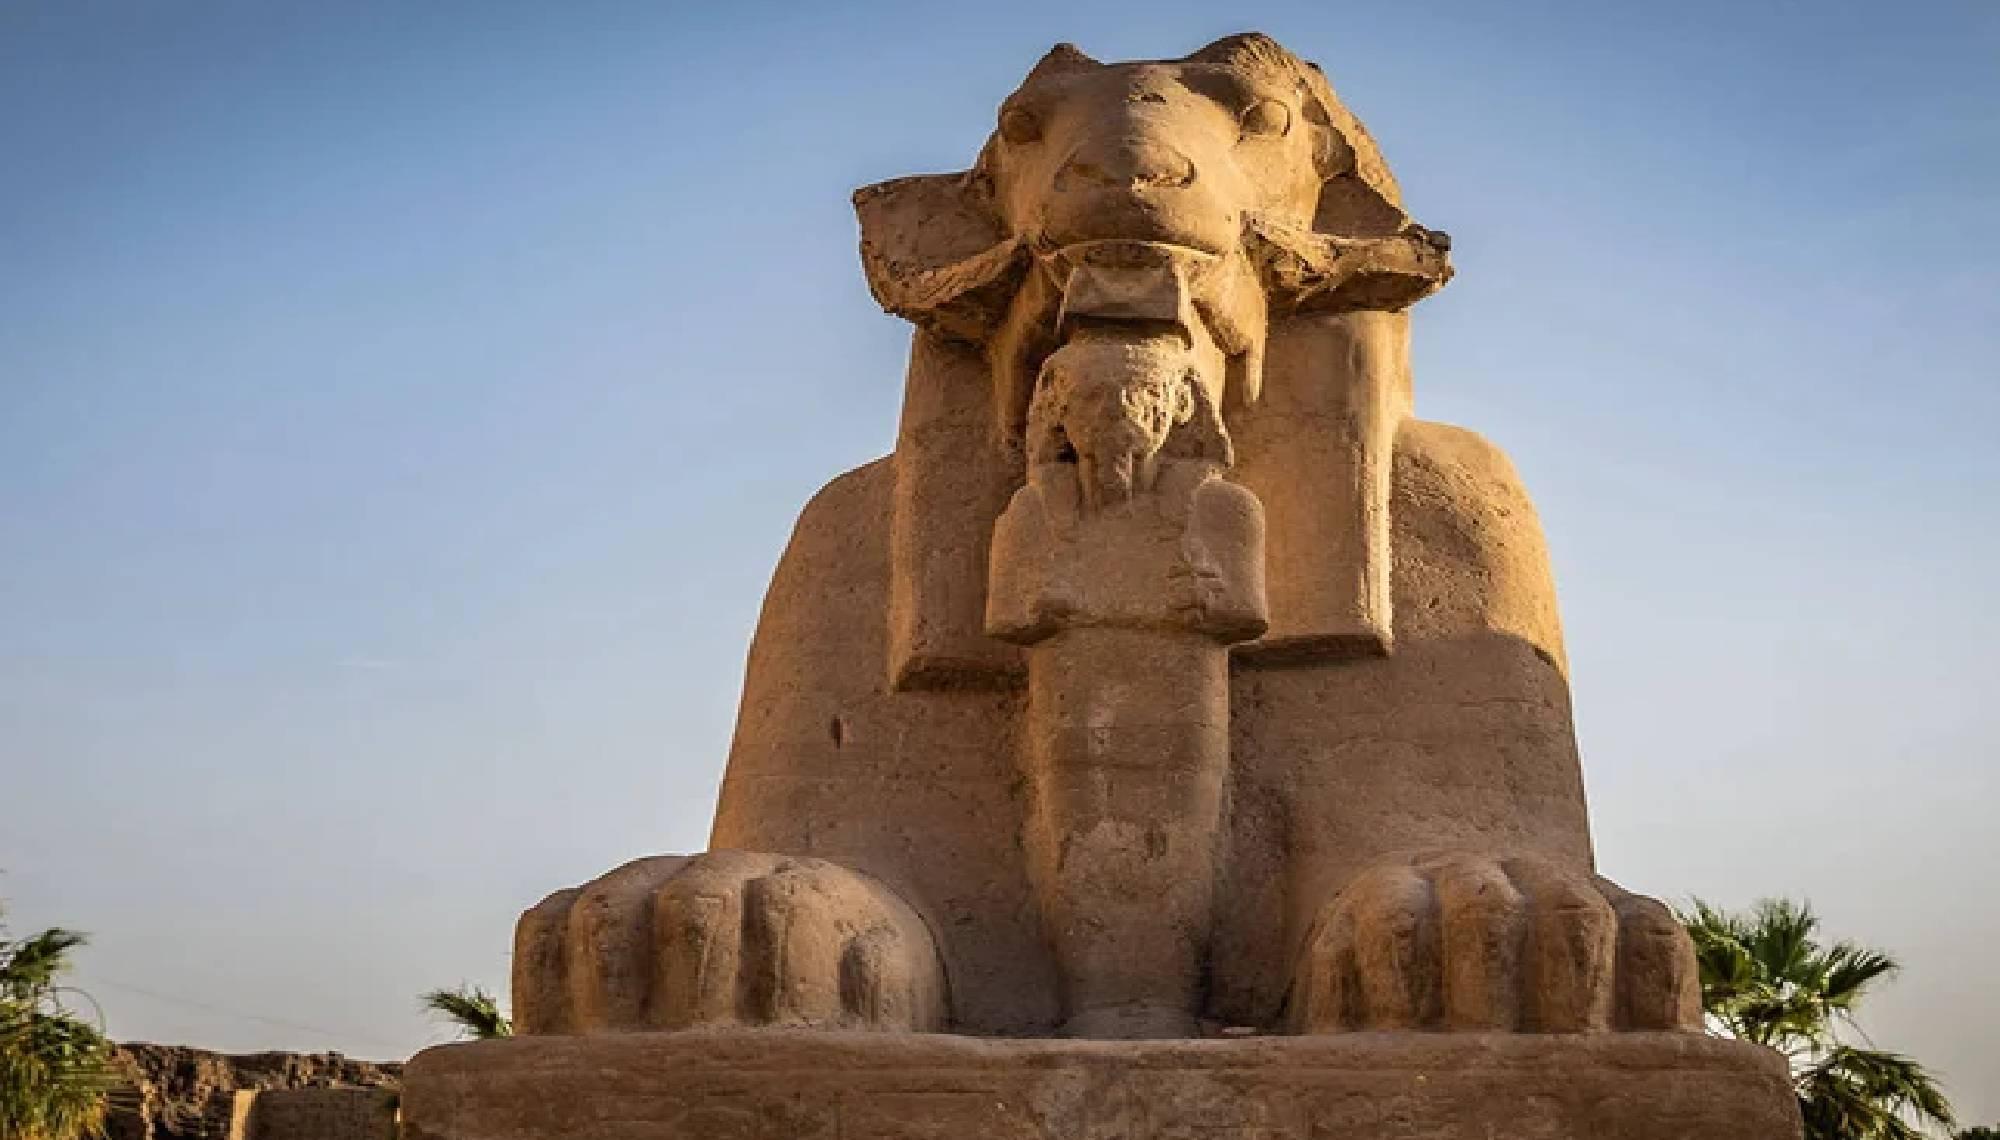 piramides en egipto durante el retiro de yoga por el nilo